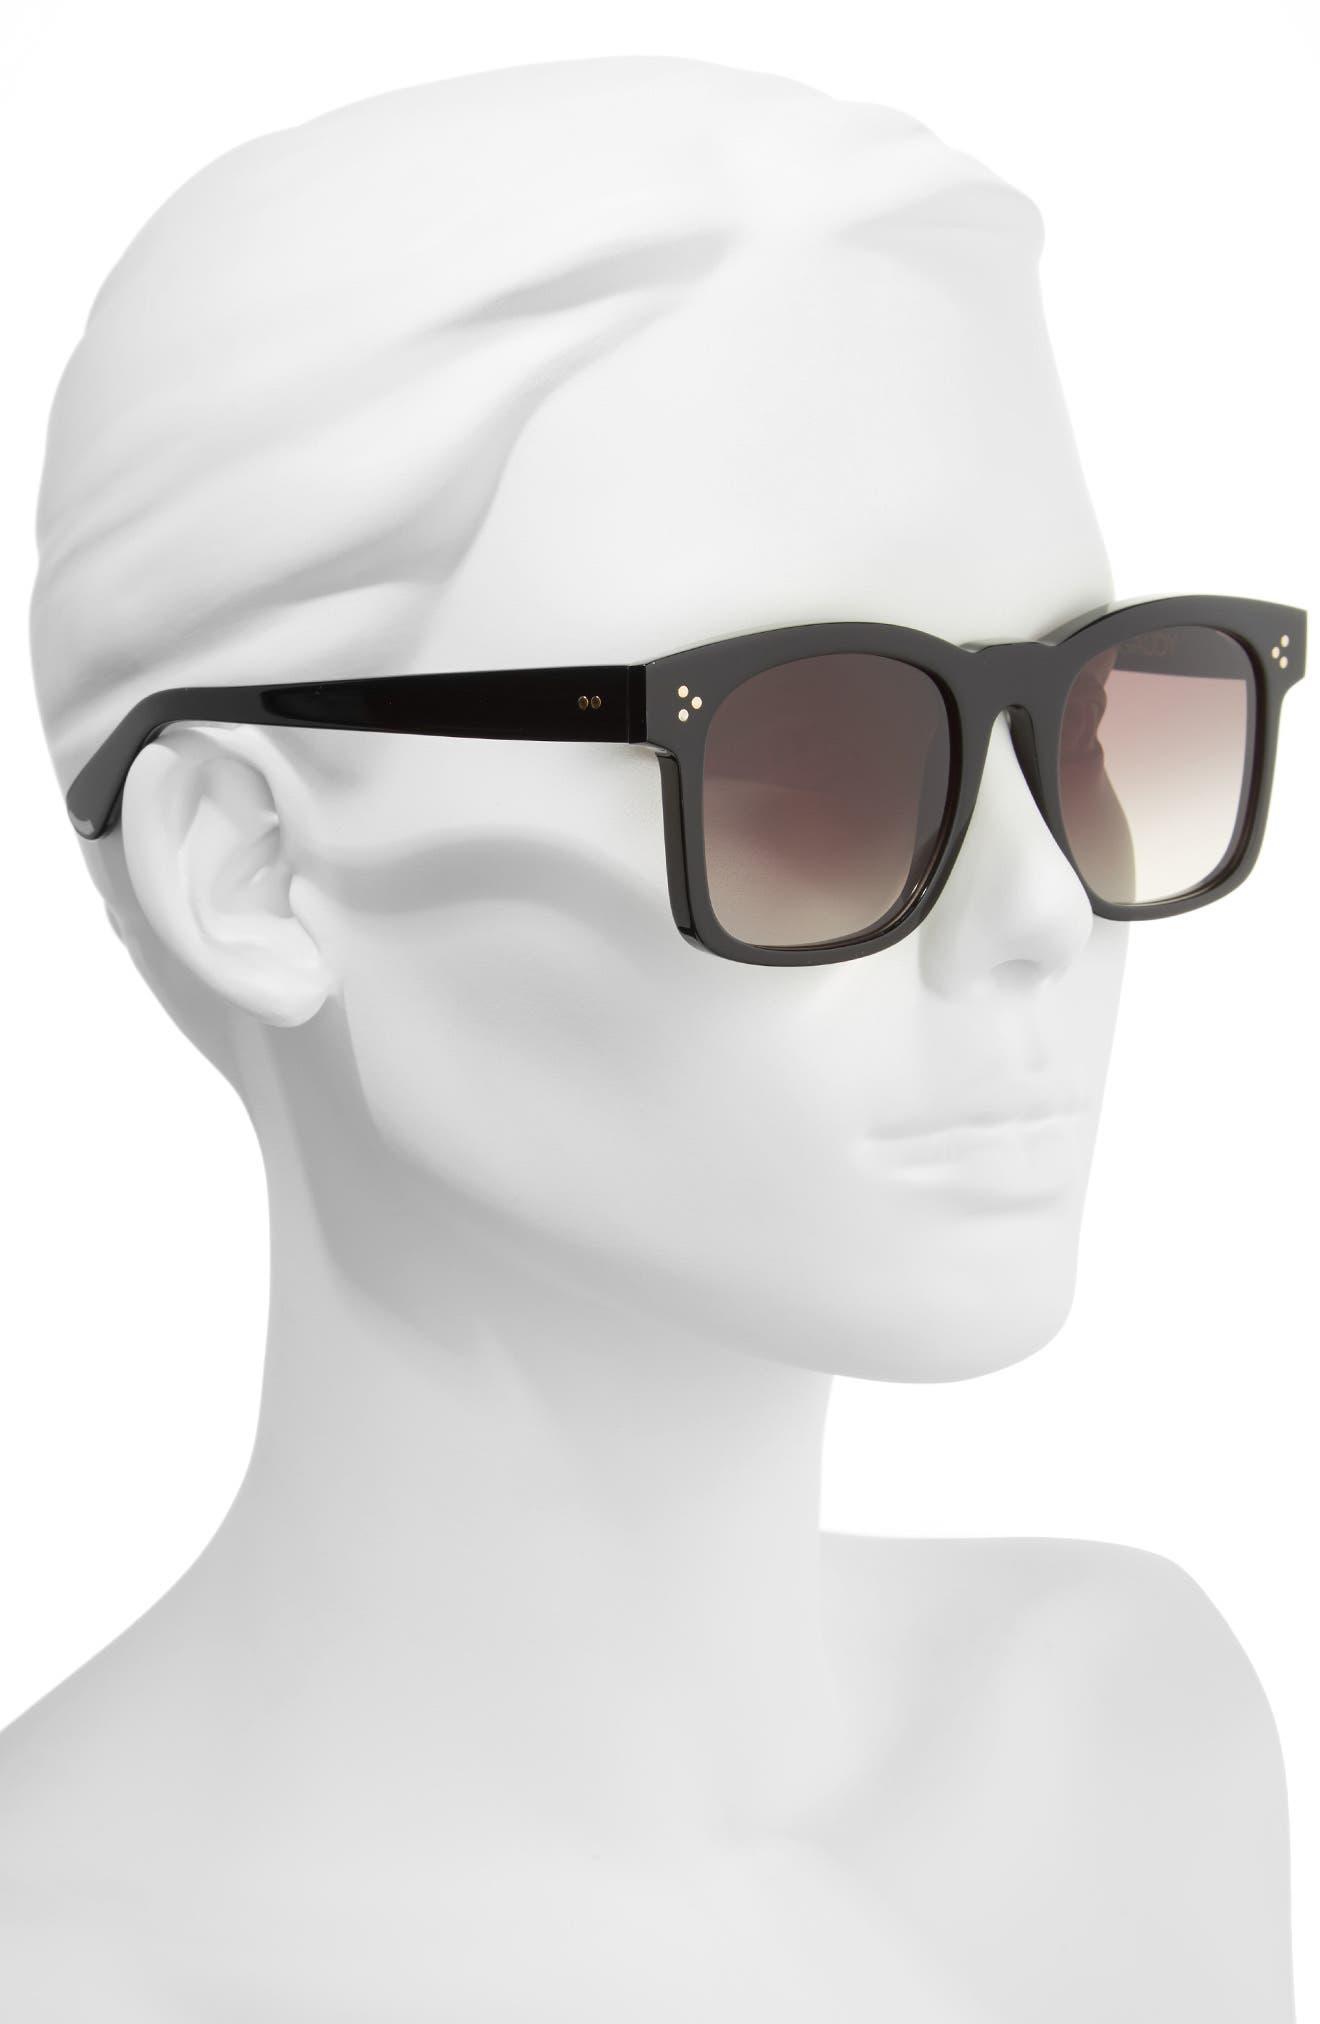 Gaudy Zero 51mm Flat Square Sunglasses,                             Alternate thumbnail 3, color,                             Black